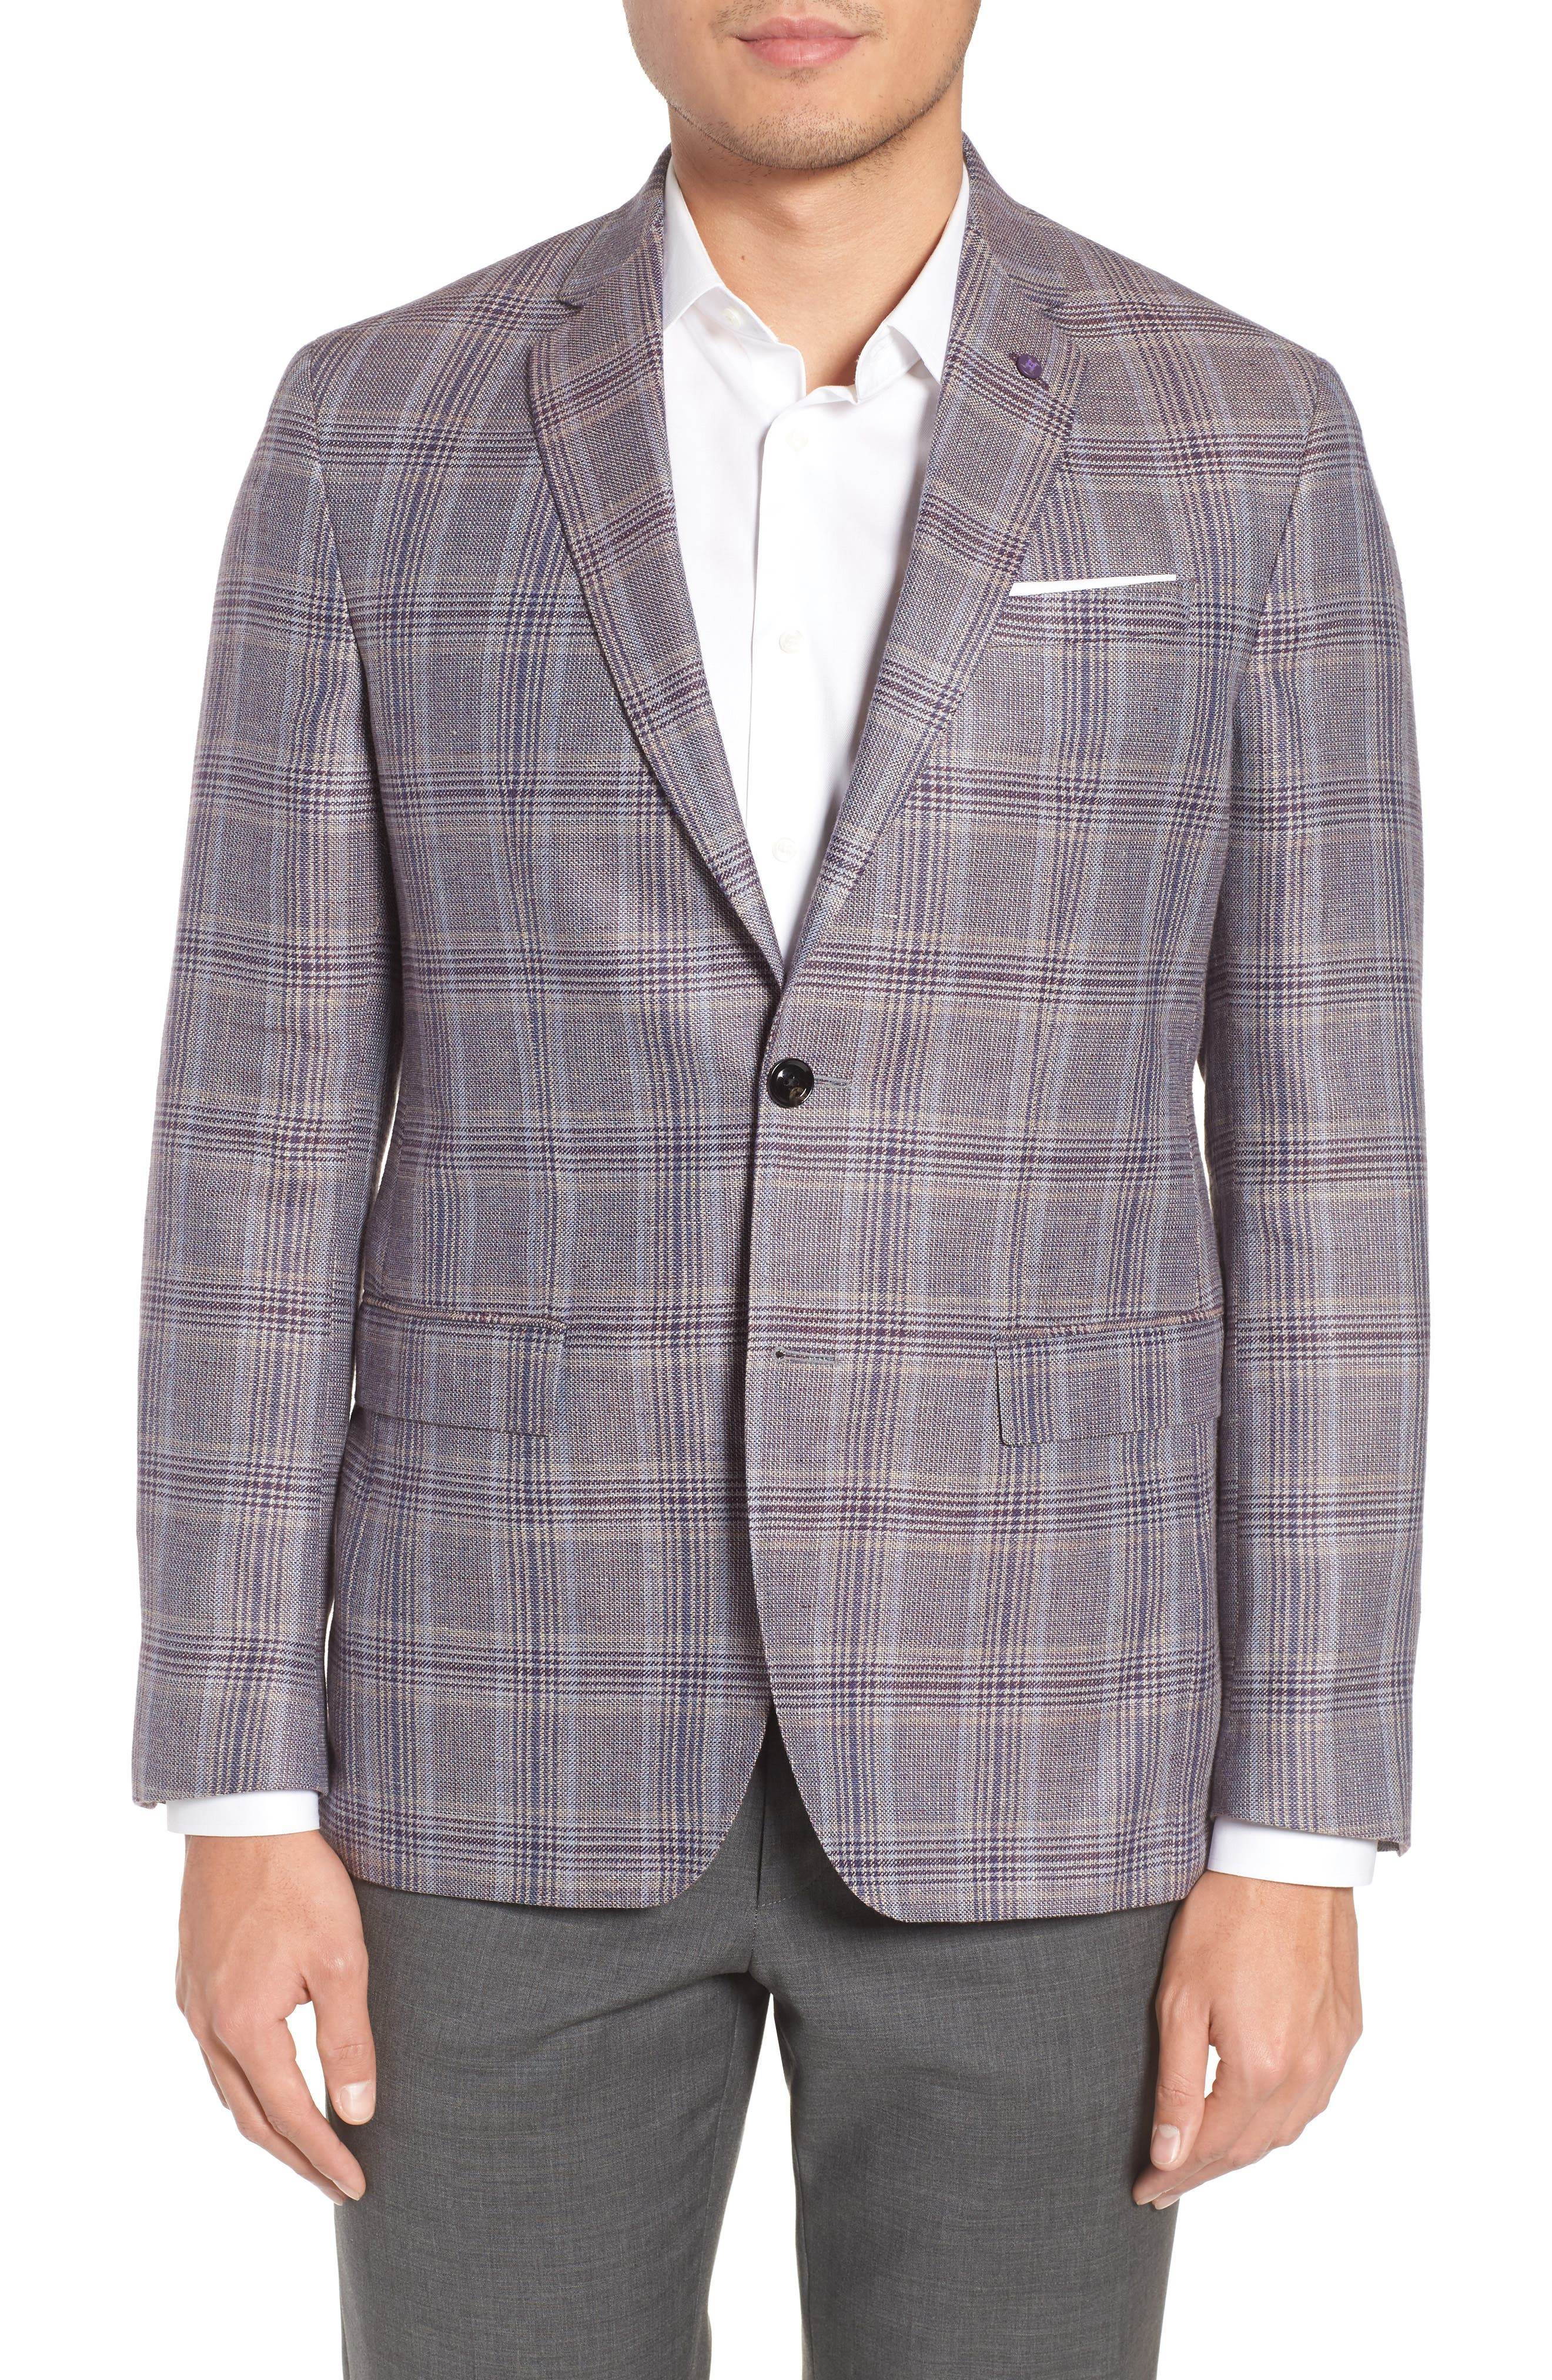 Main Image - Ted Baker London Konan Trim Fit Plaid Linen & Wool Sport Coat